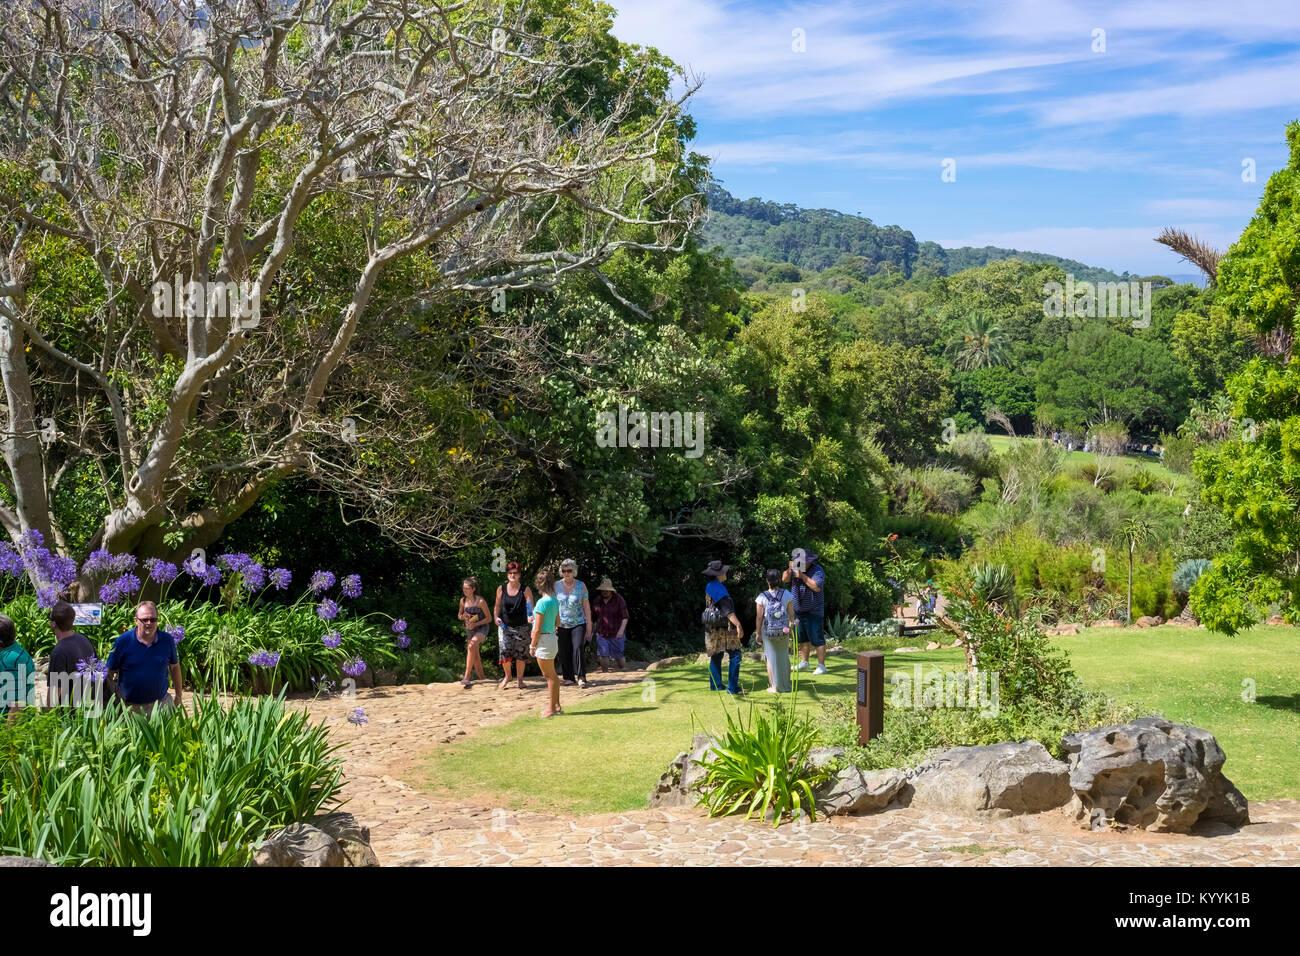 Kirstenbosch National Botanical Gardens, in Newlands, Kapstadt, Südafrika Stockbild